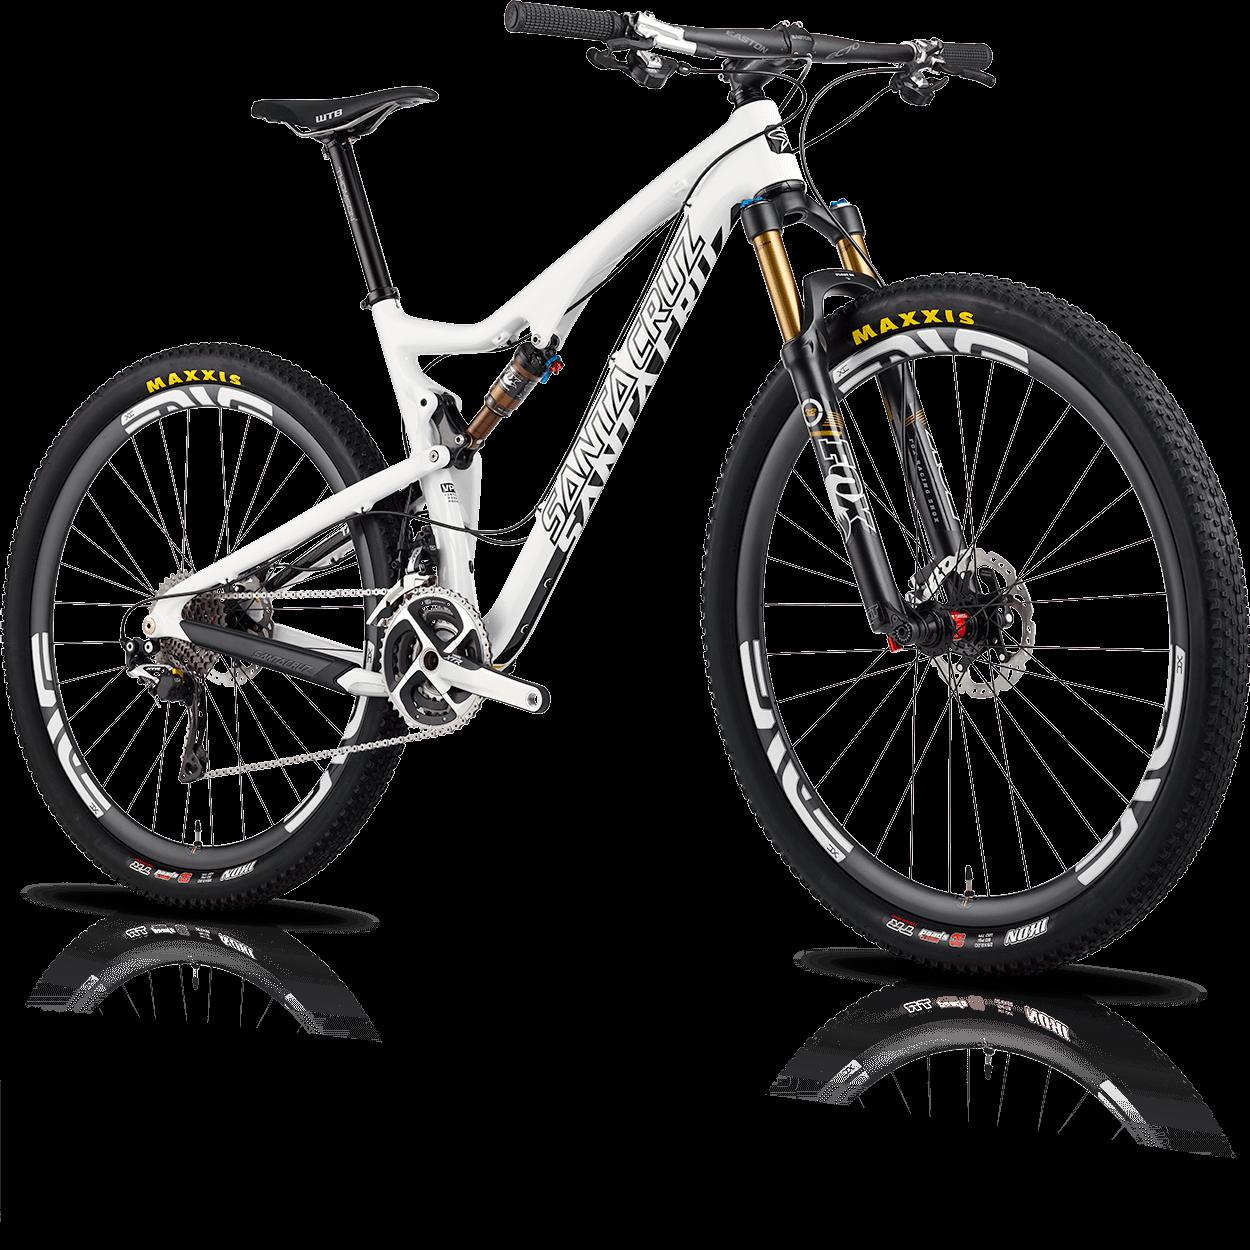 d3fcbcc4108 Dream Bike - Santa Cruz Bicycles Tallboy Carbon Fixie